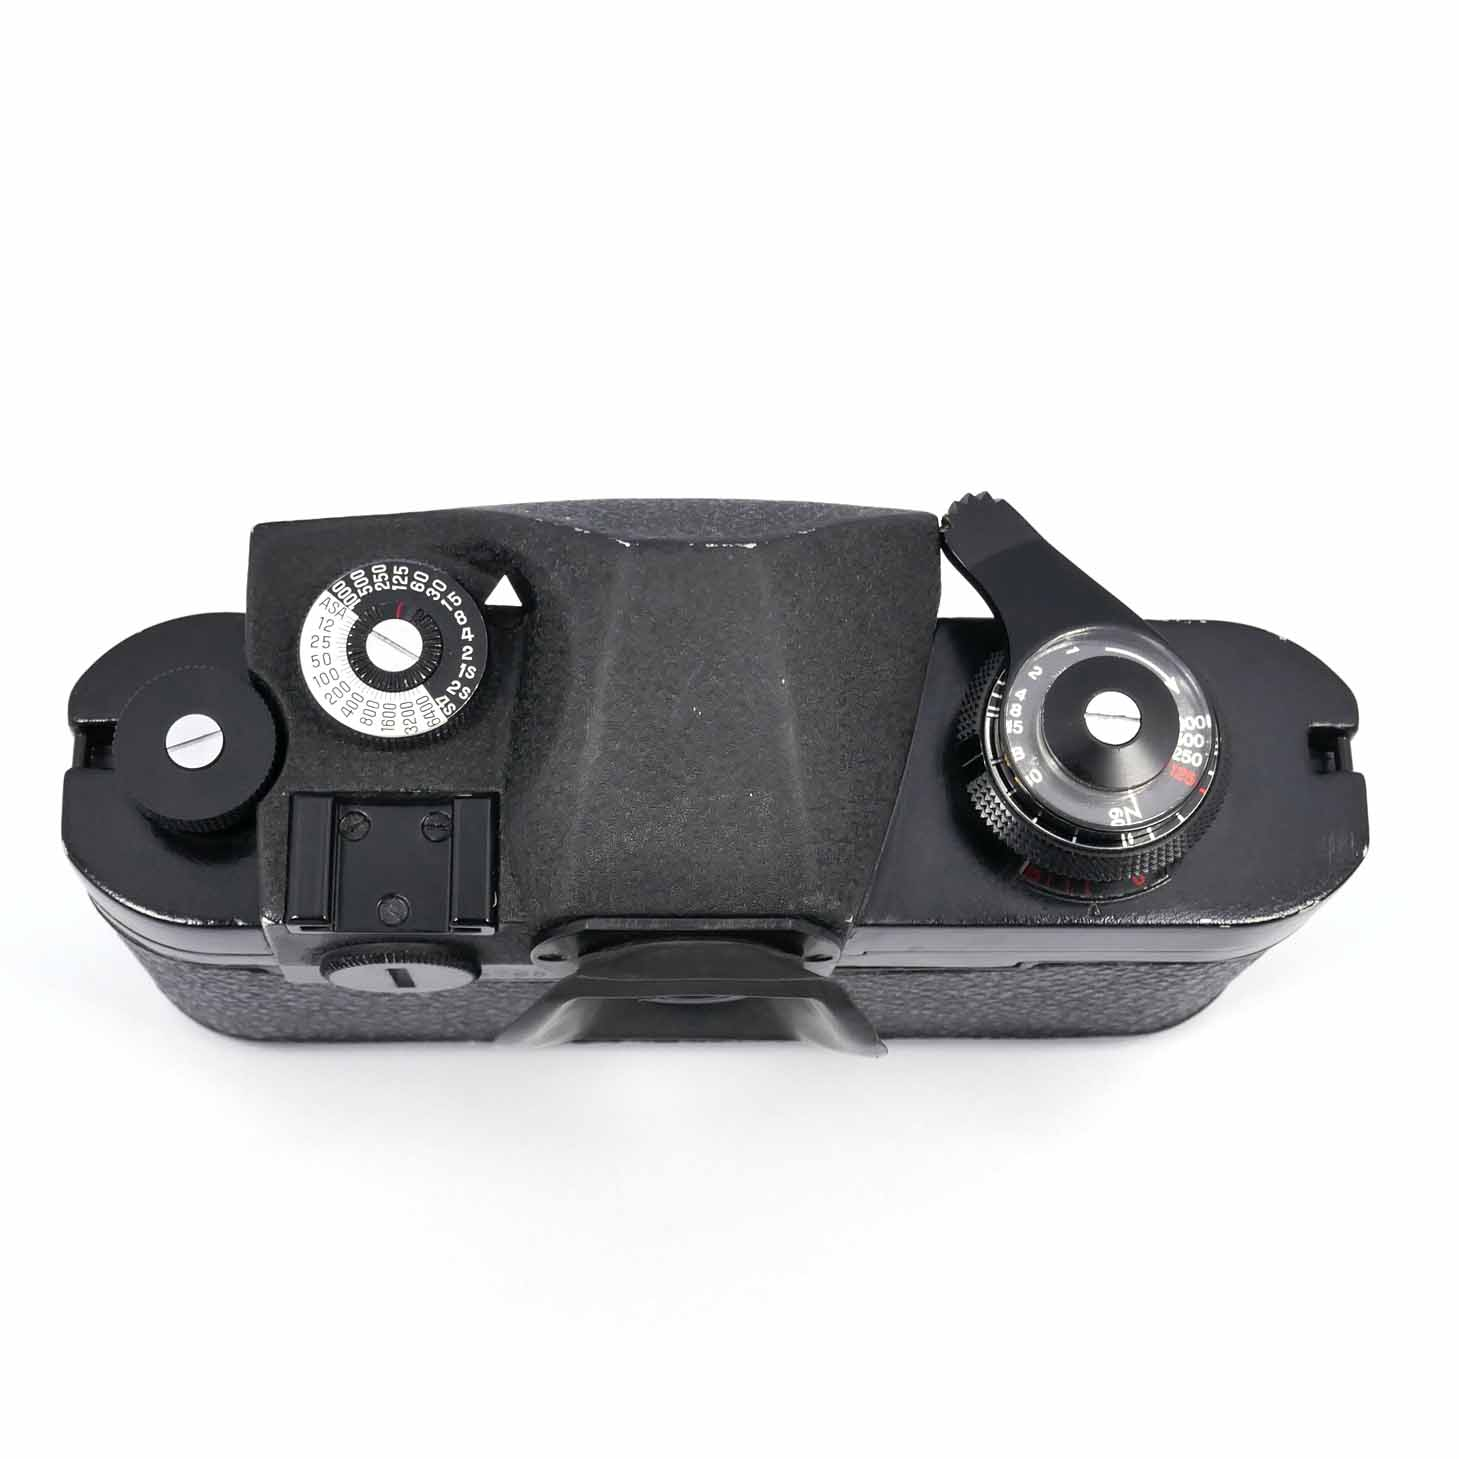 clean-cameras-Alpa-9d-Body-black-09